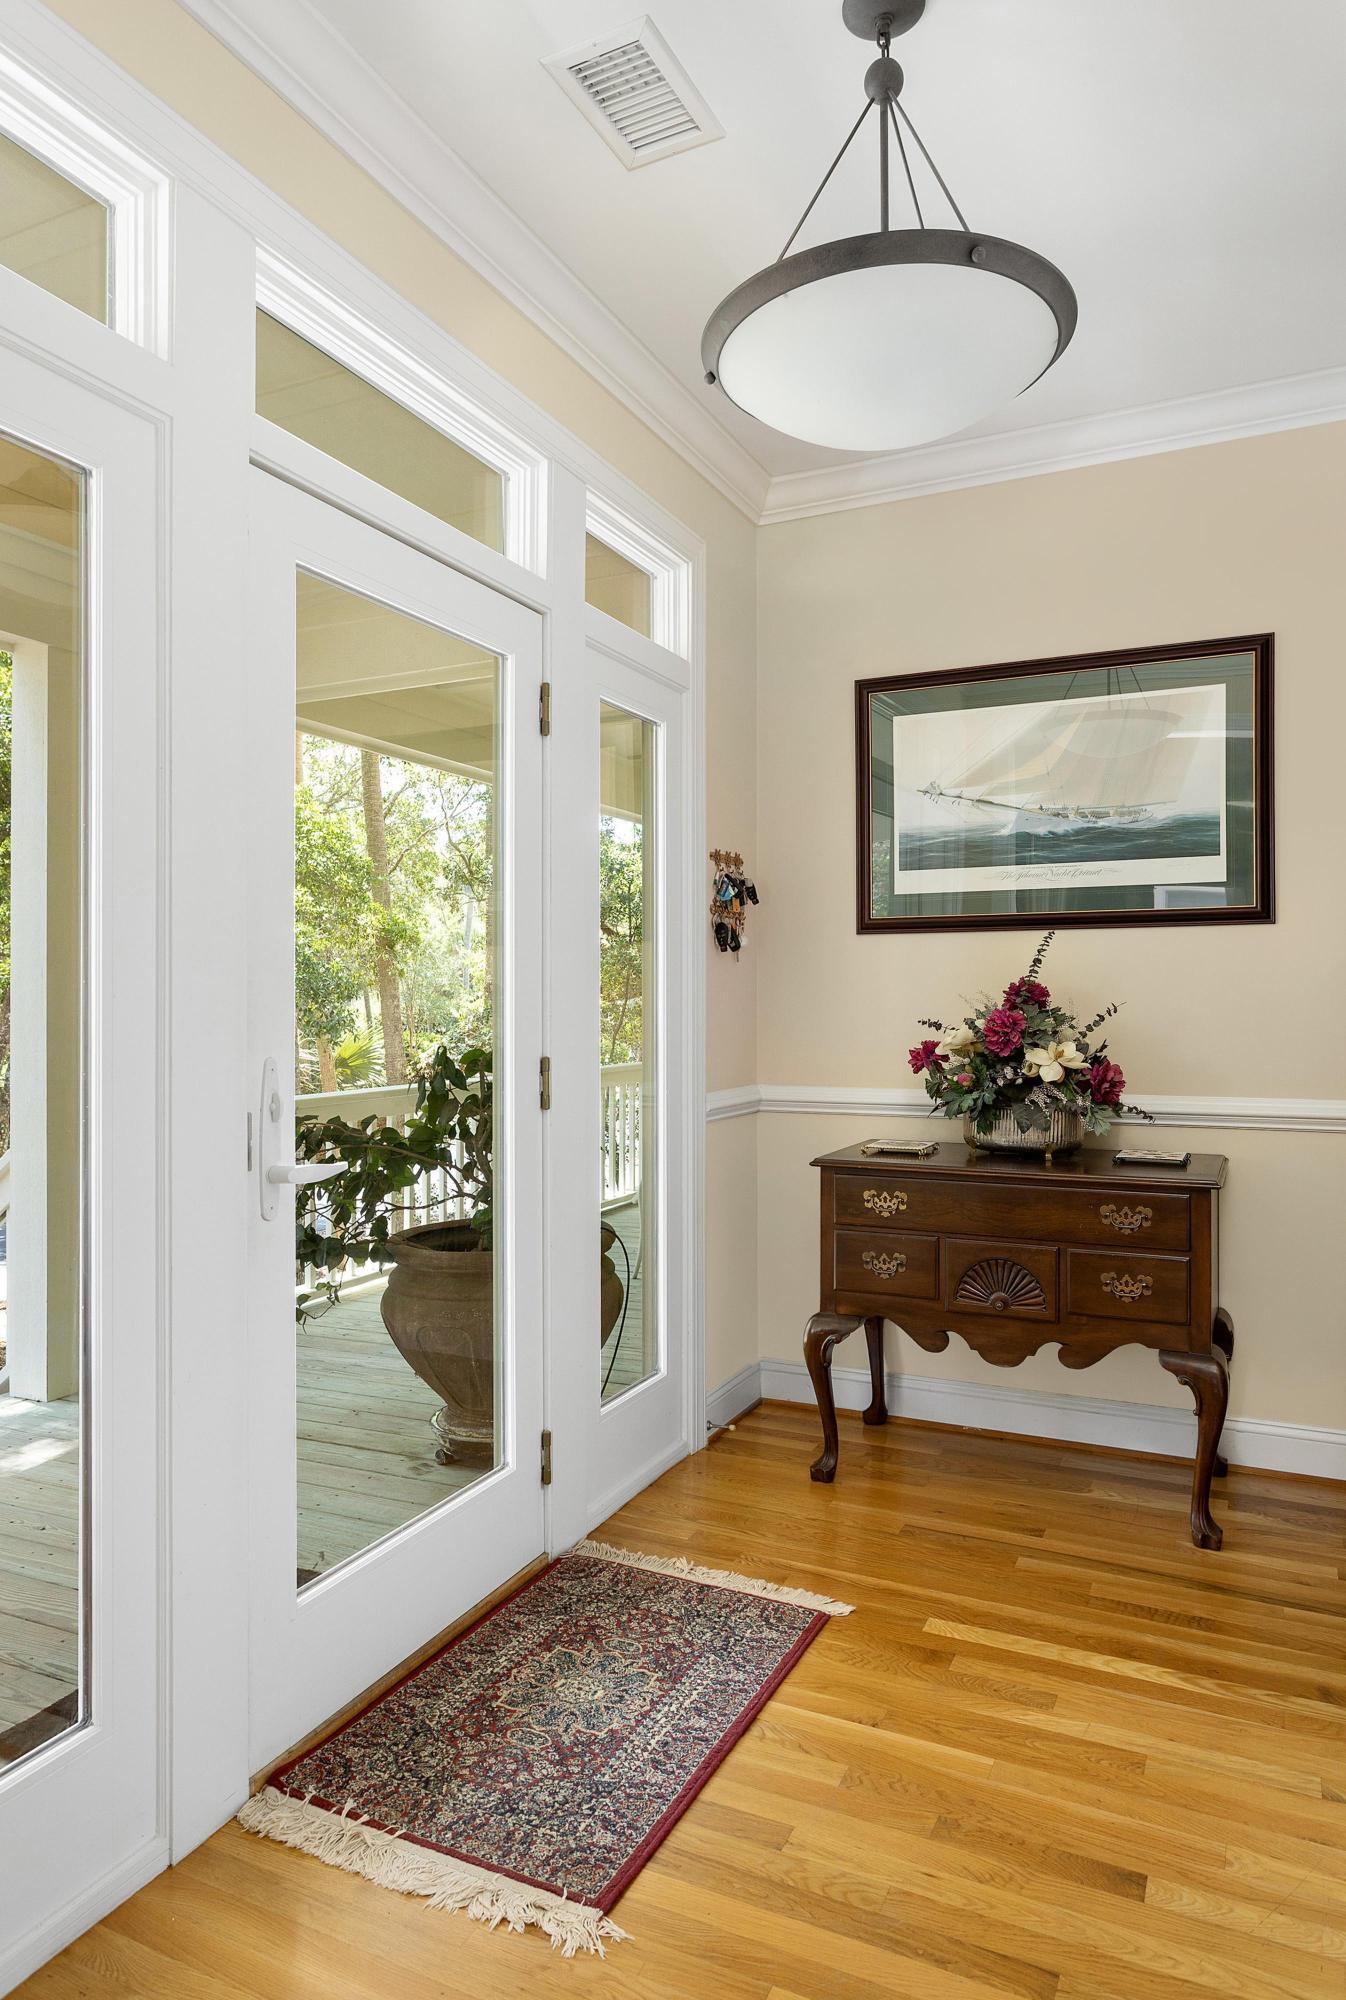 Seabrook Island Homes For Sale - 1014 Crooked Oaks, Seabrook Island, SC - 51